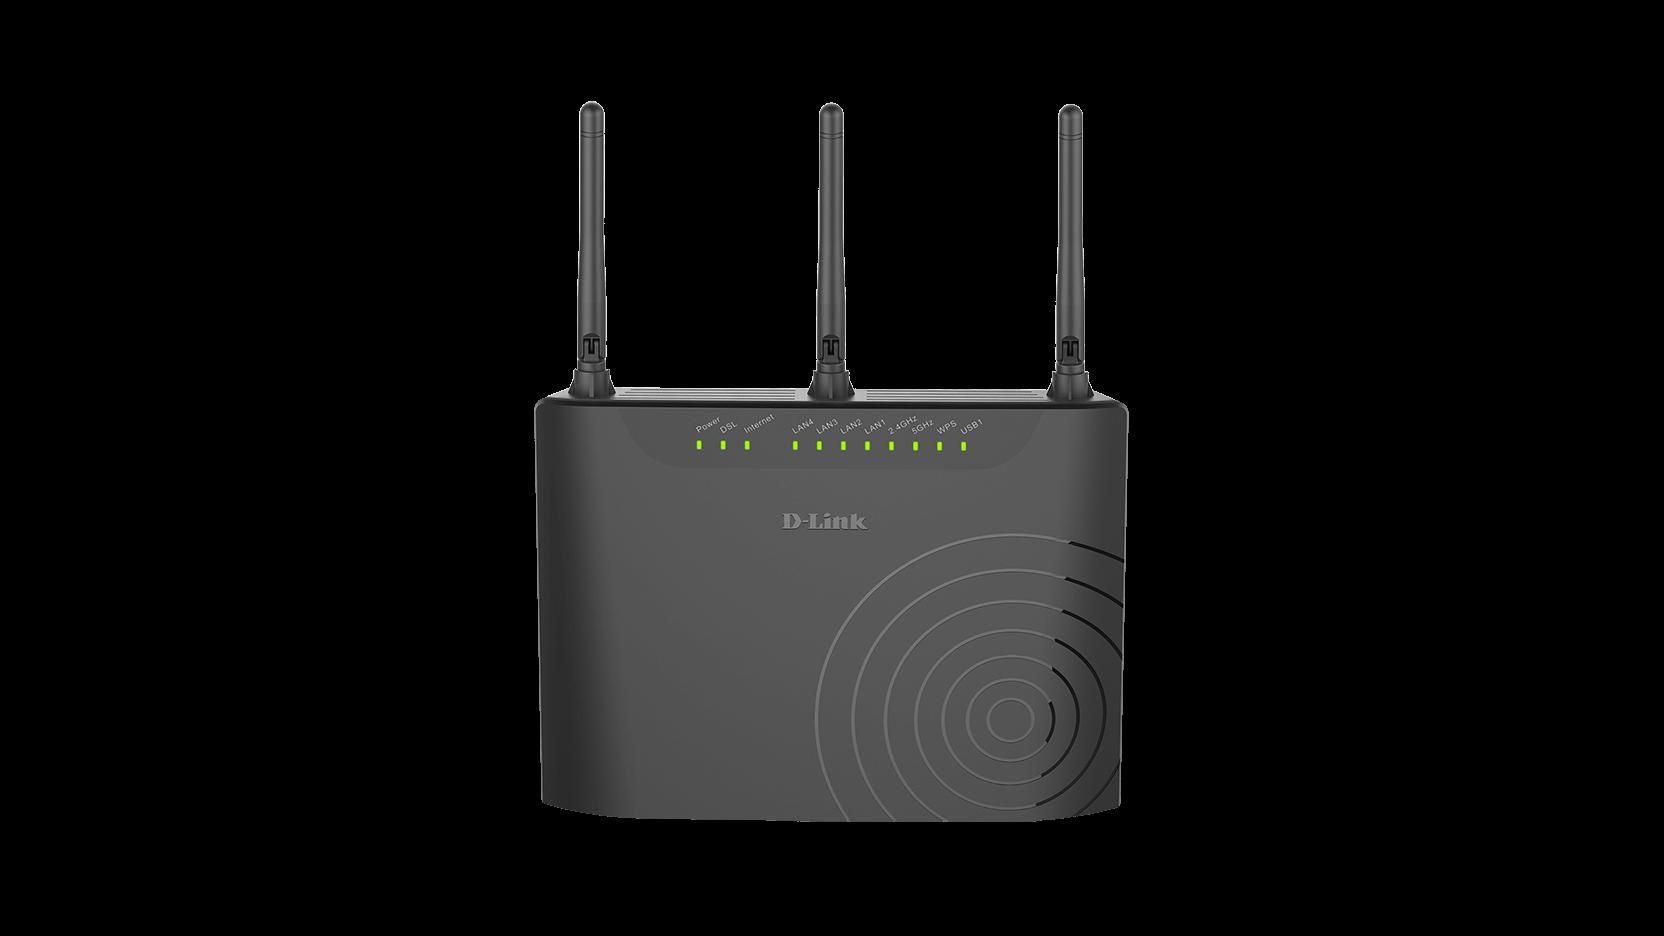 DSL-3682 Wireless AC750 Dual-Band VDSL/ADSL Modem Router   D-Link ...